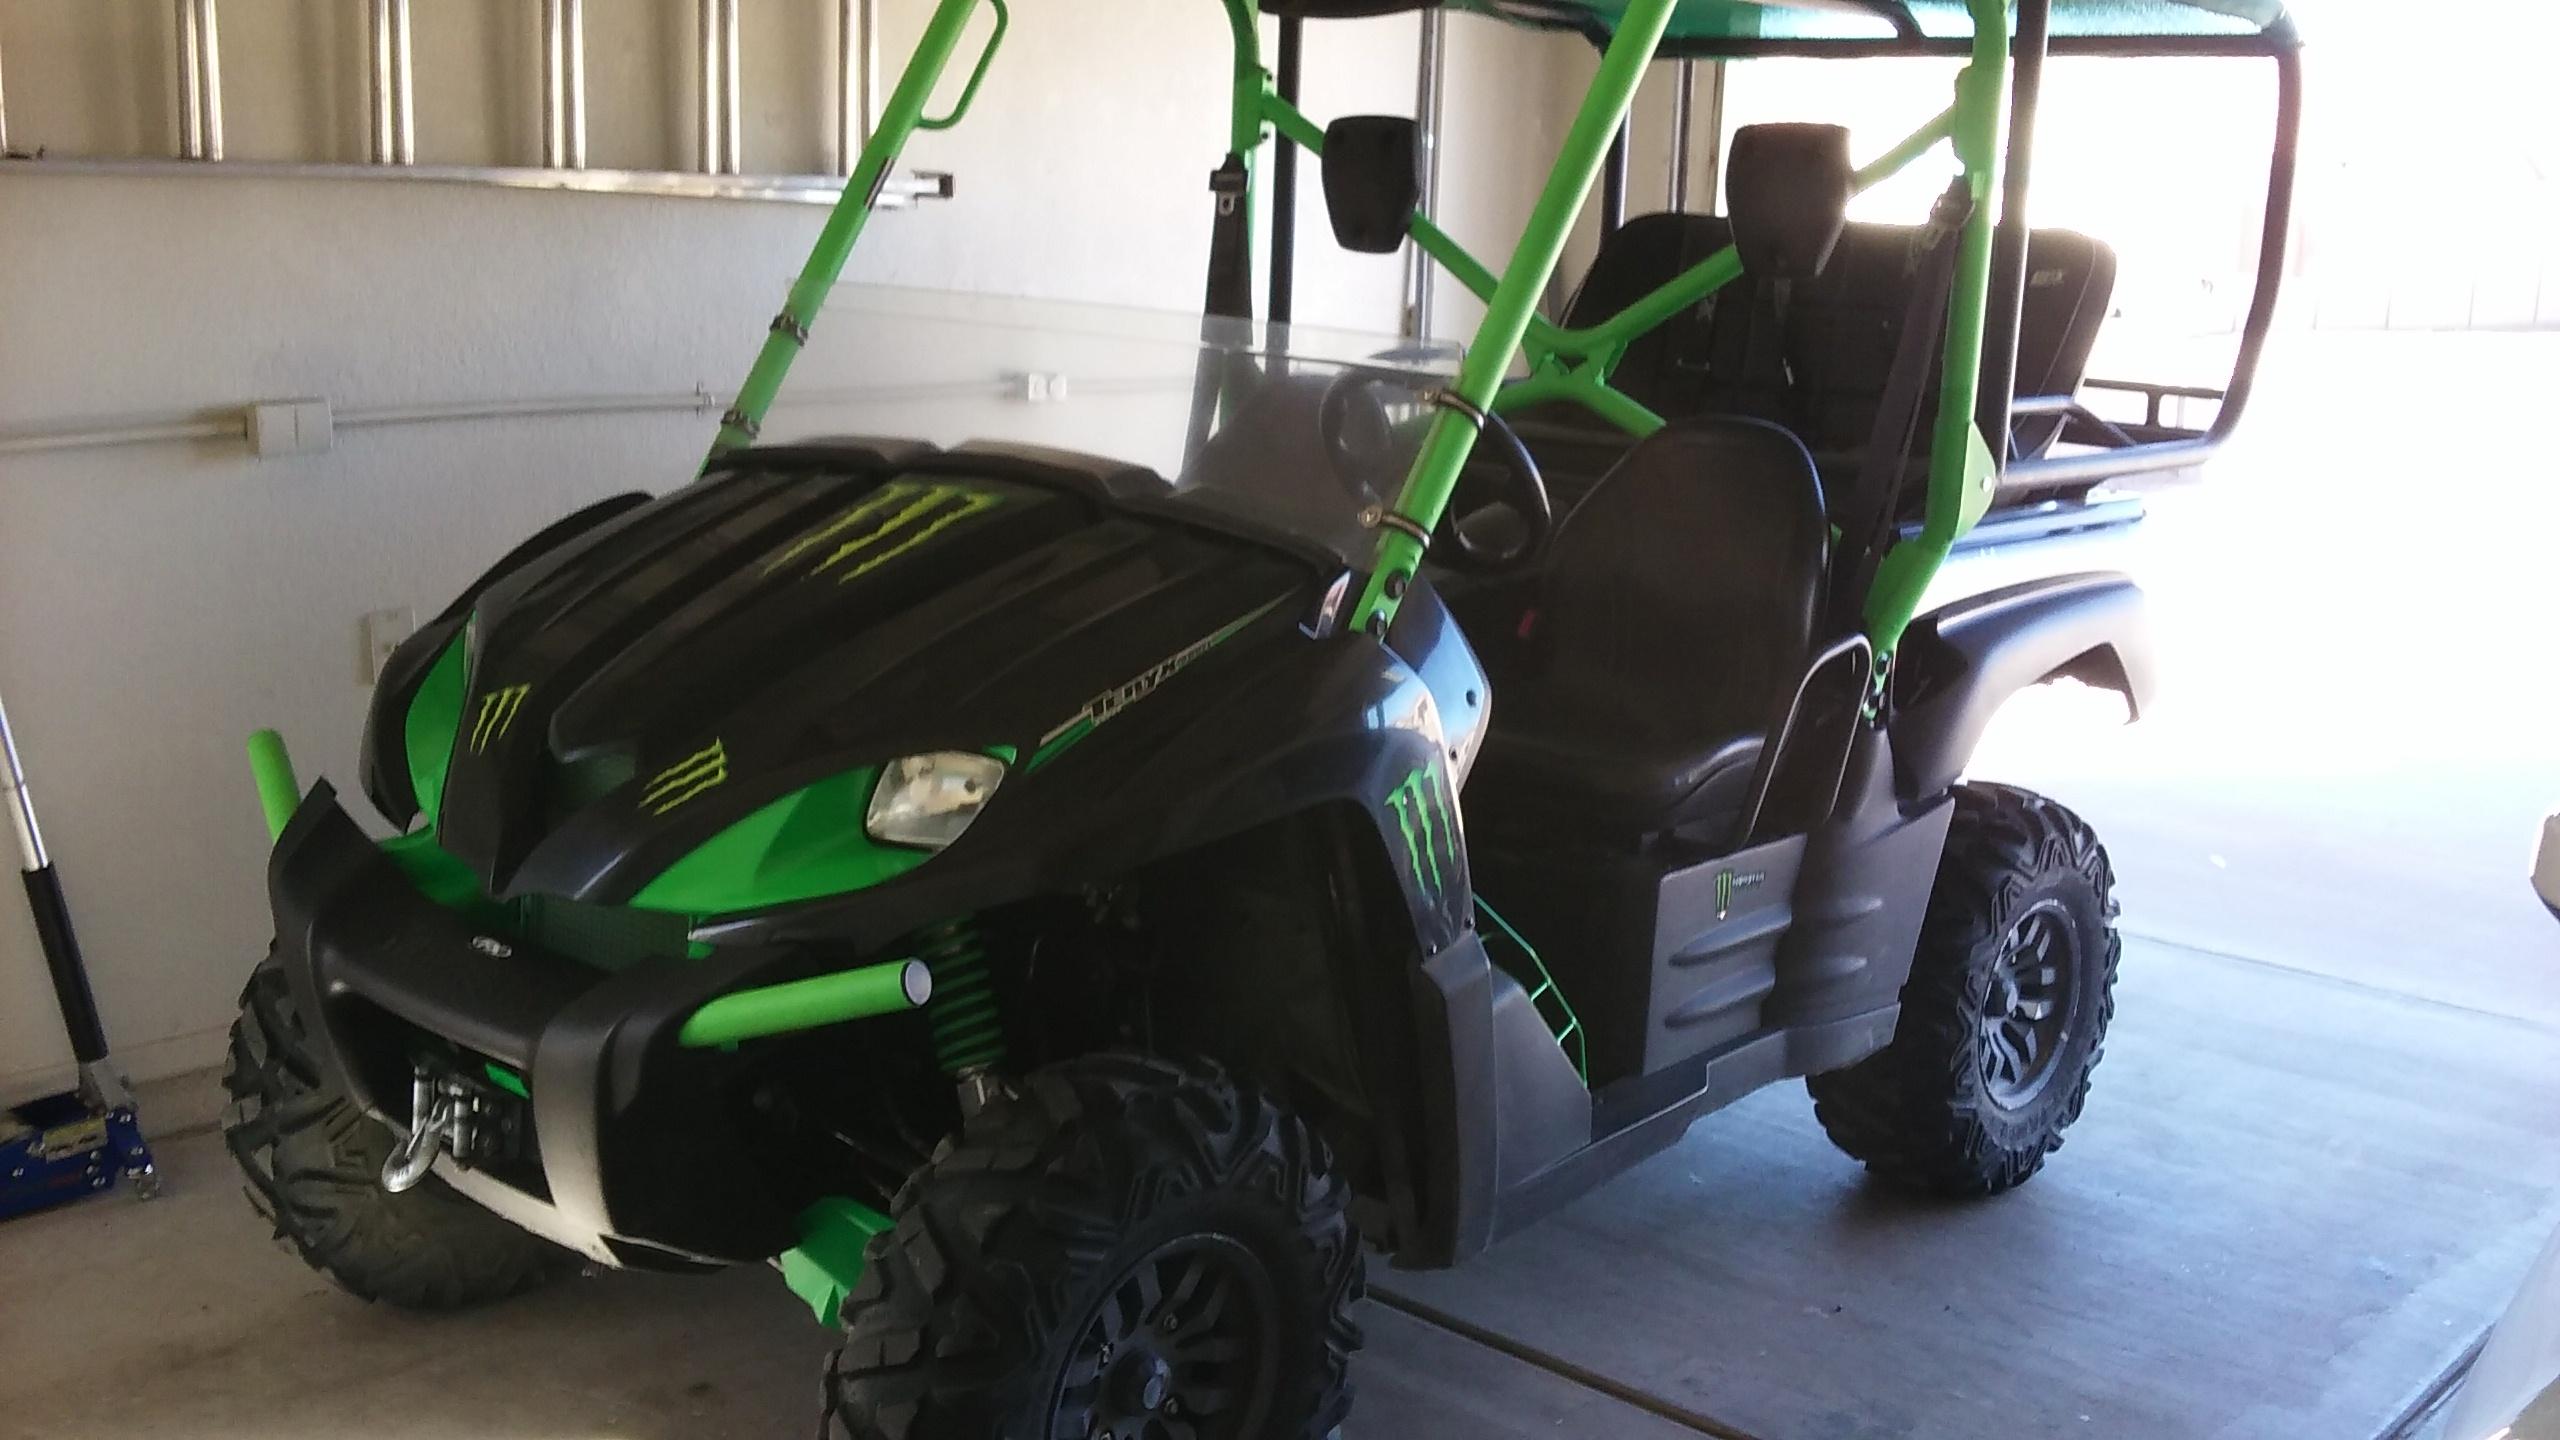 2009 Teryx 750 Monster Energy Edition